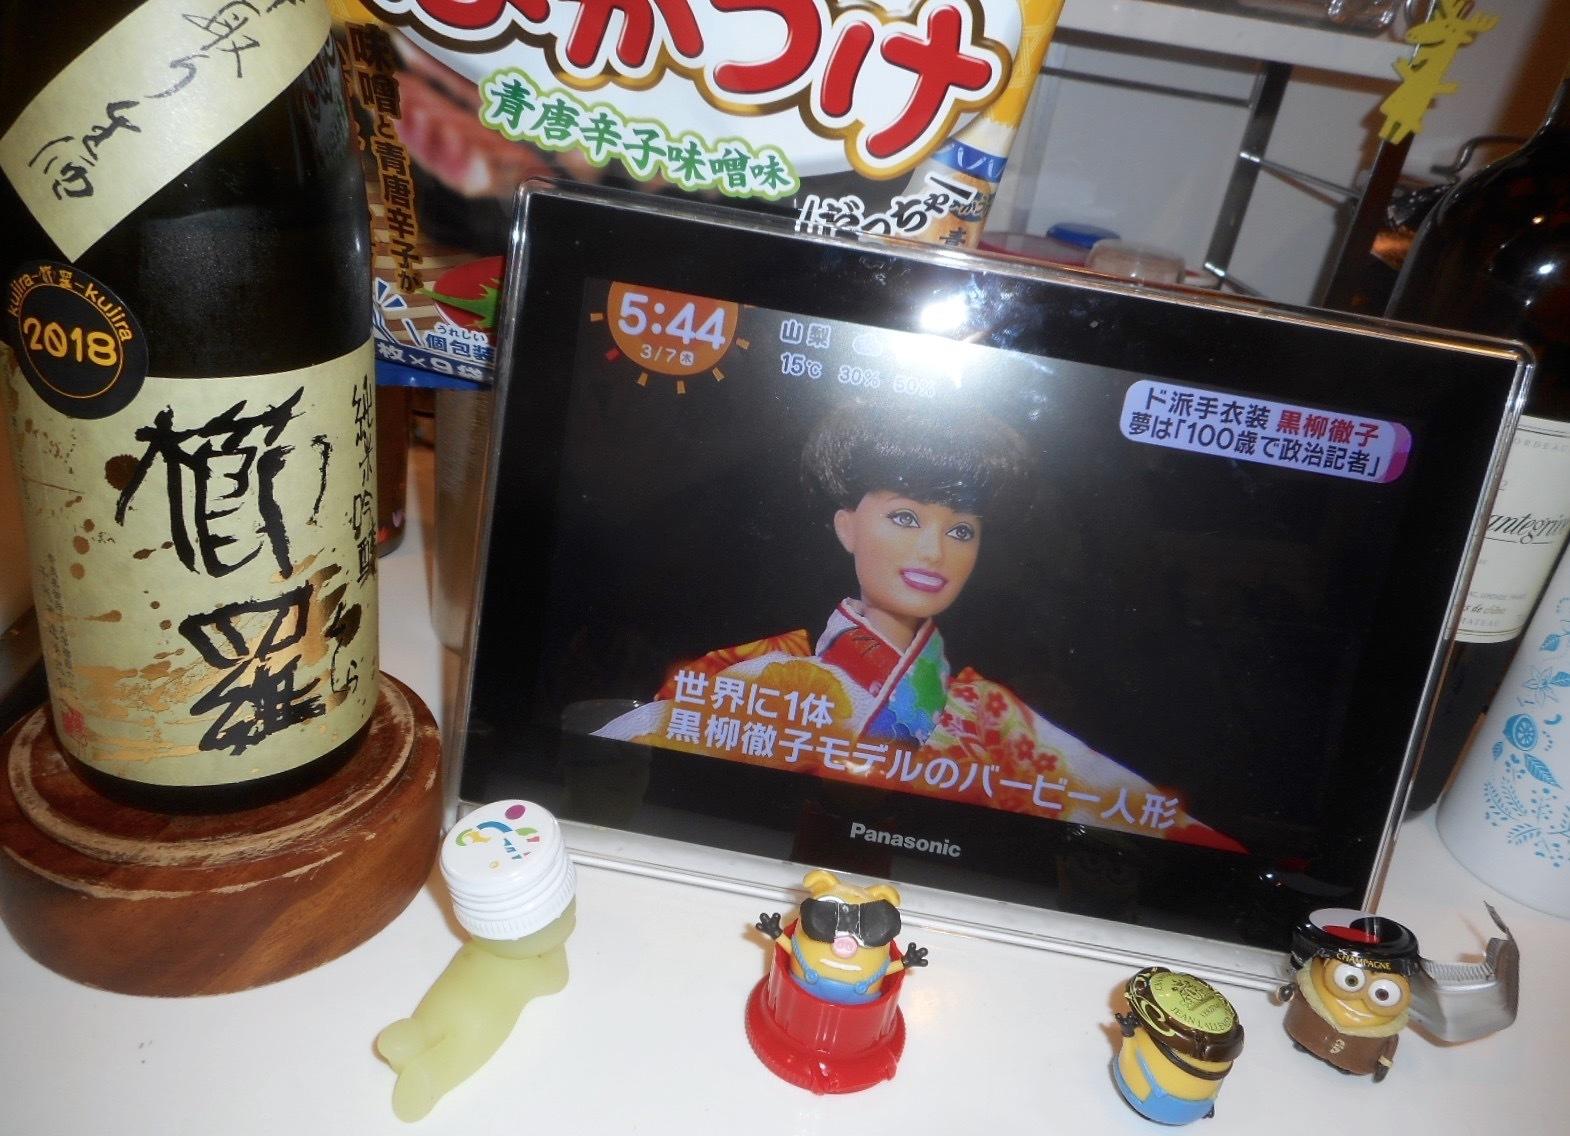 kujira_jungin30by1.jpg